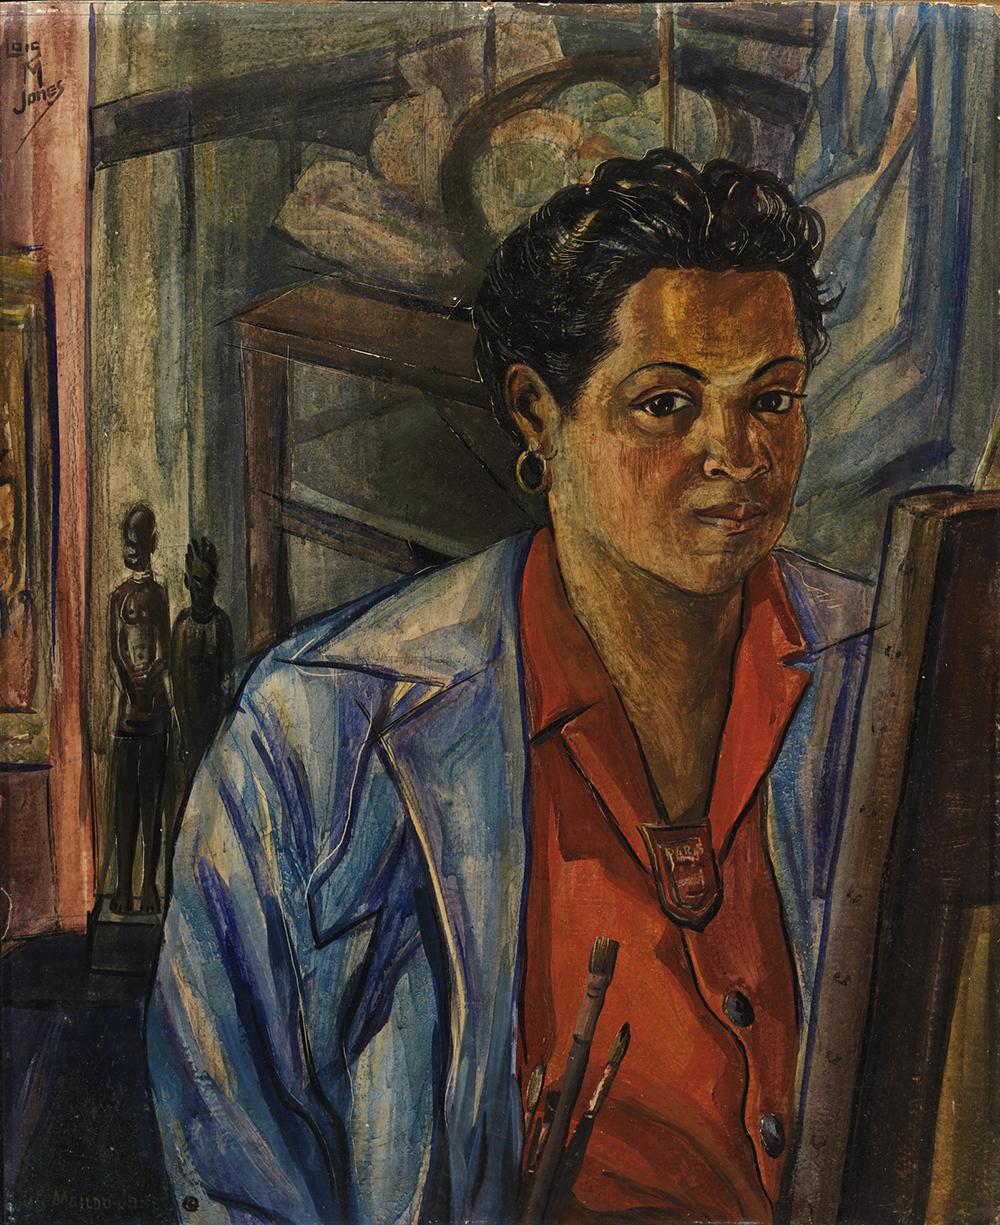 Self Portrait, by Loïs Mailou Jones, 1940. Smithsonian American Art Museum, Bequest of the artist.